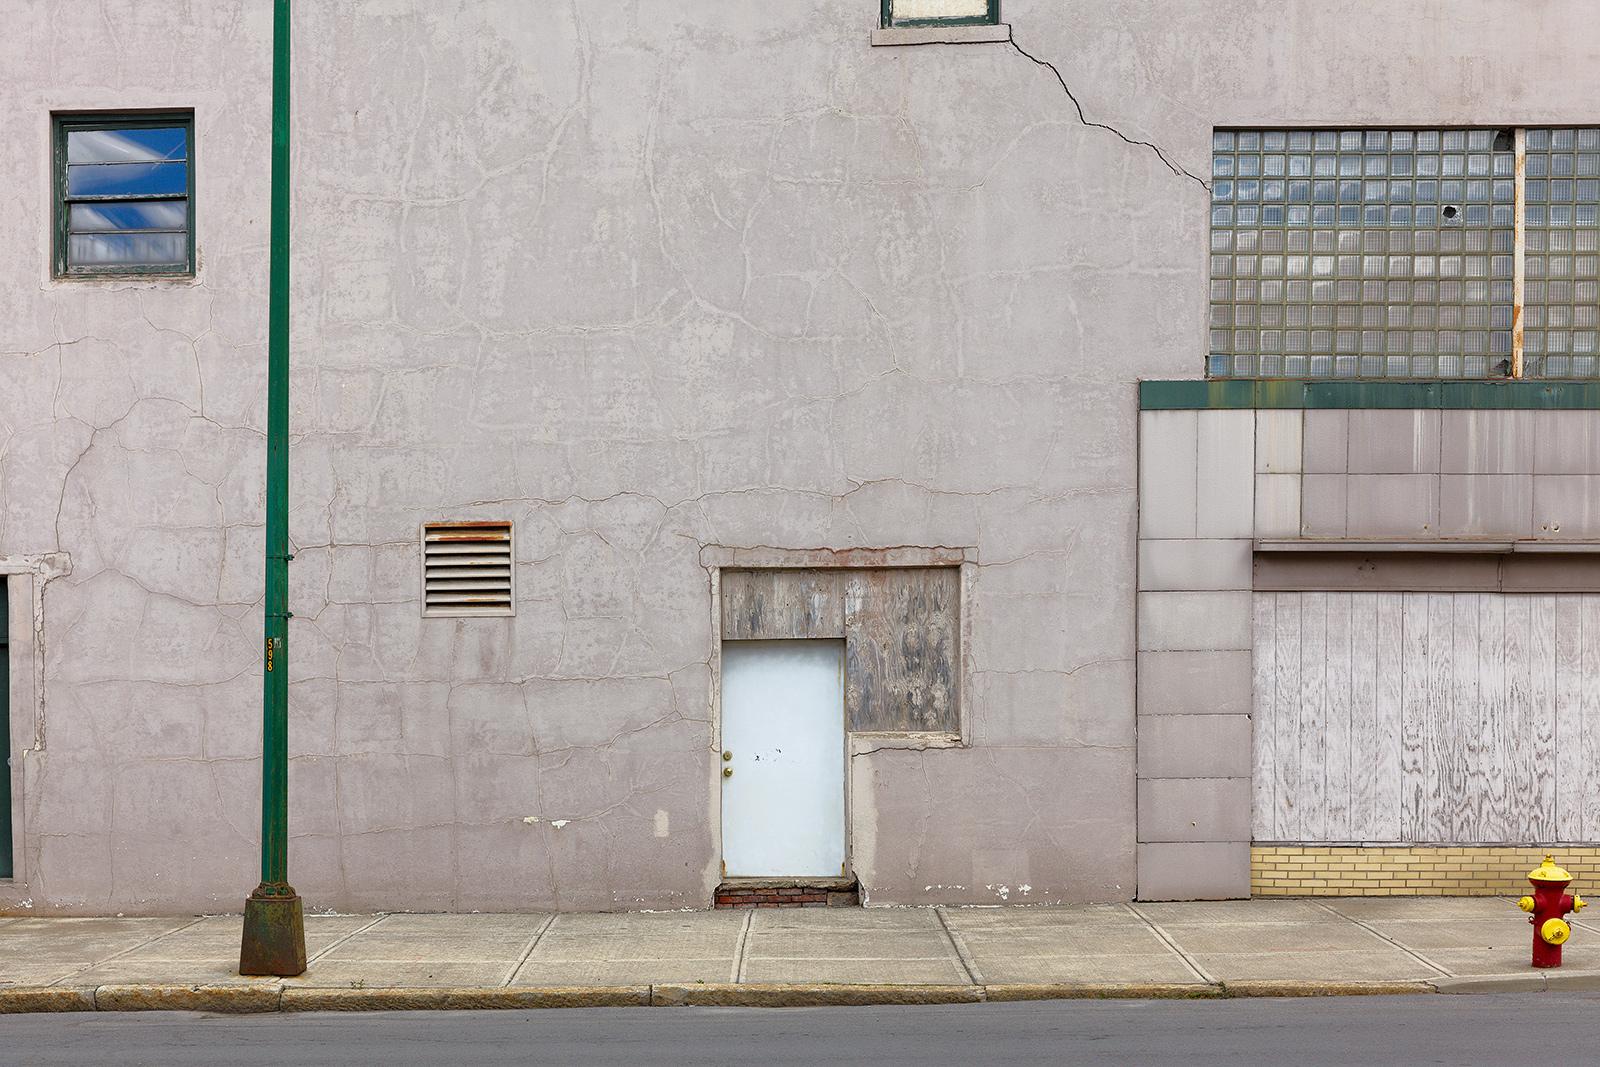 Cornelia Street, Utica, NY